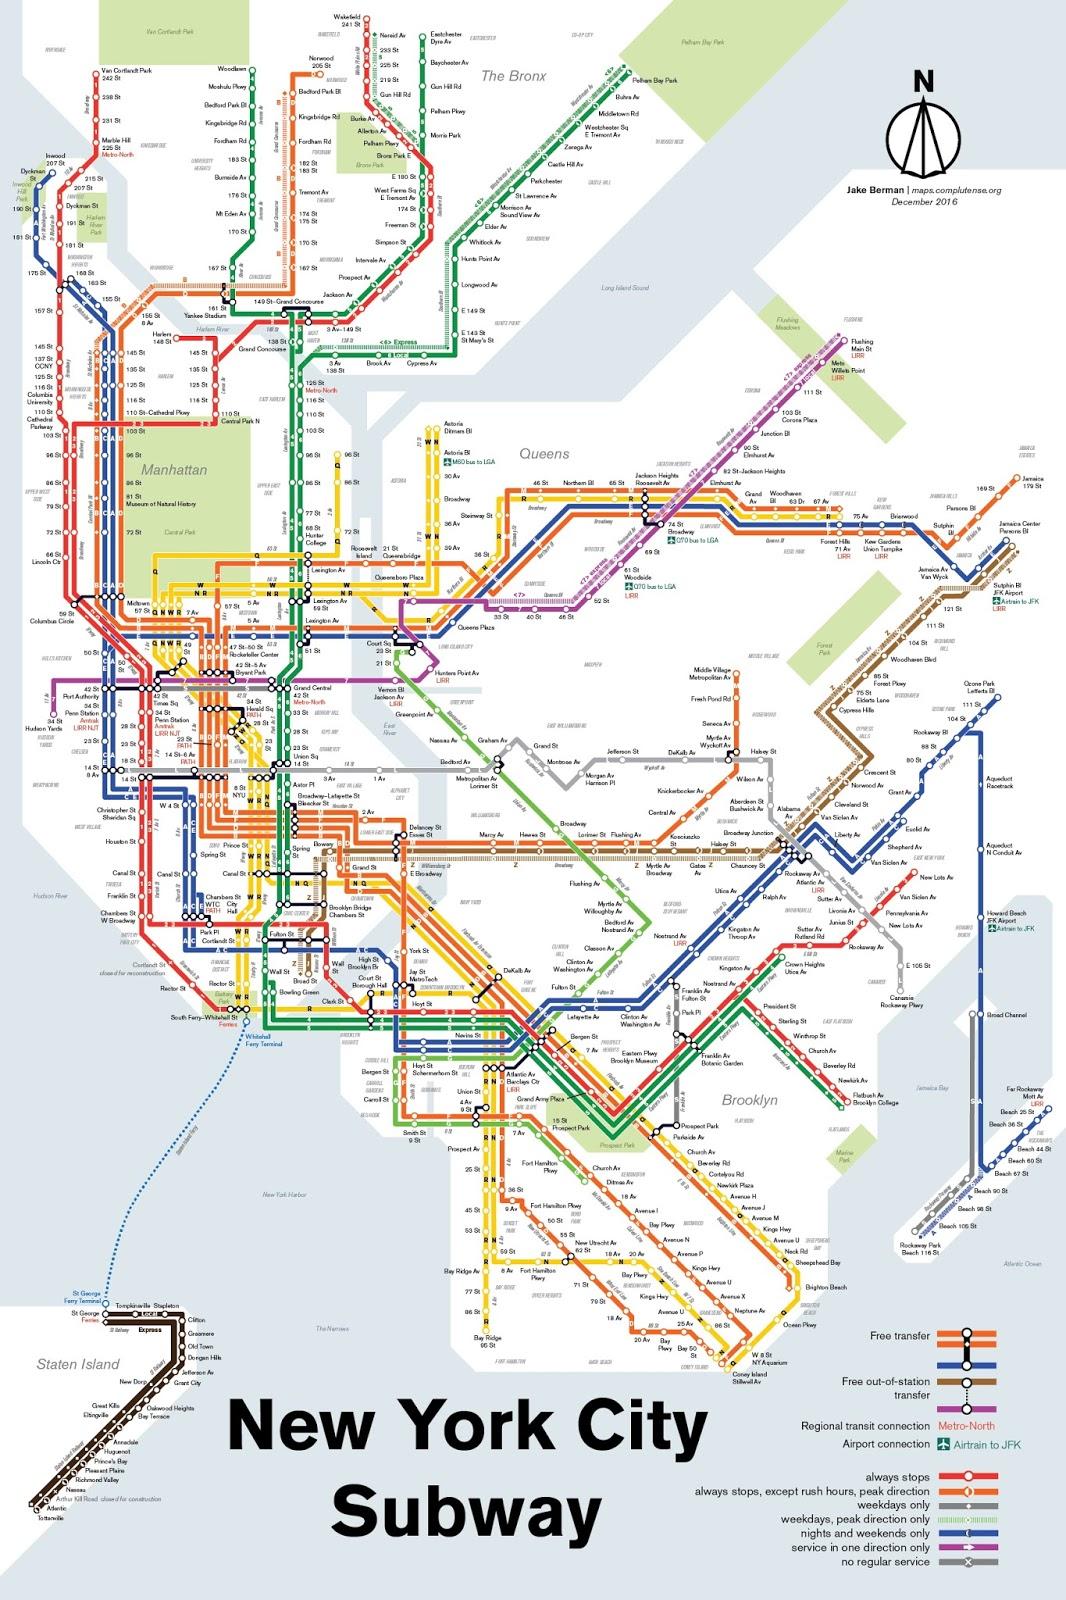 New York City Subway (December 2016)